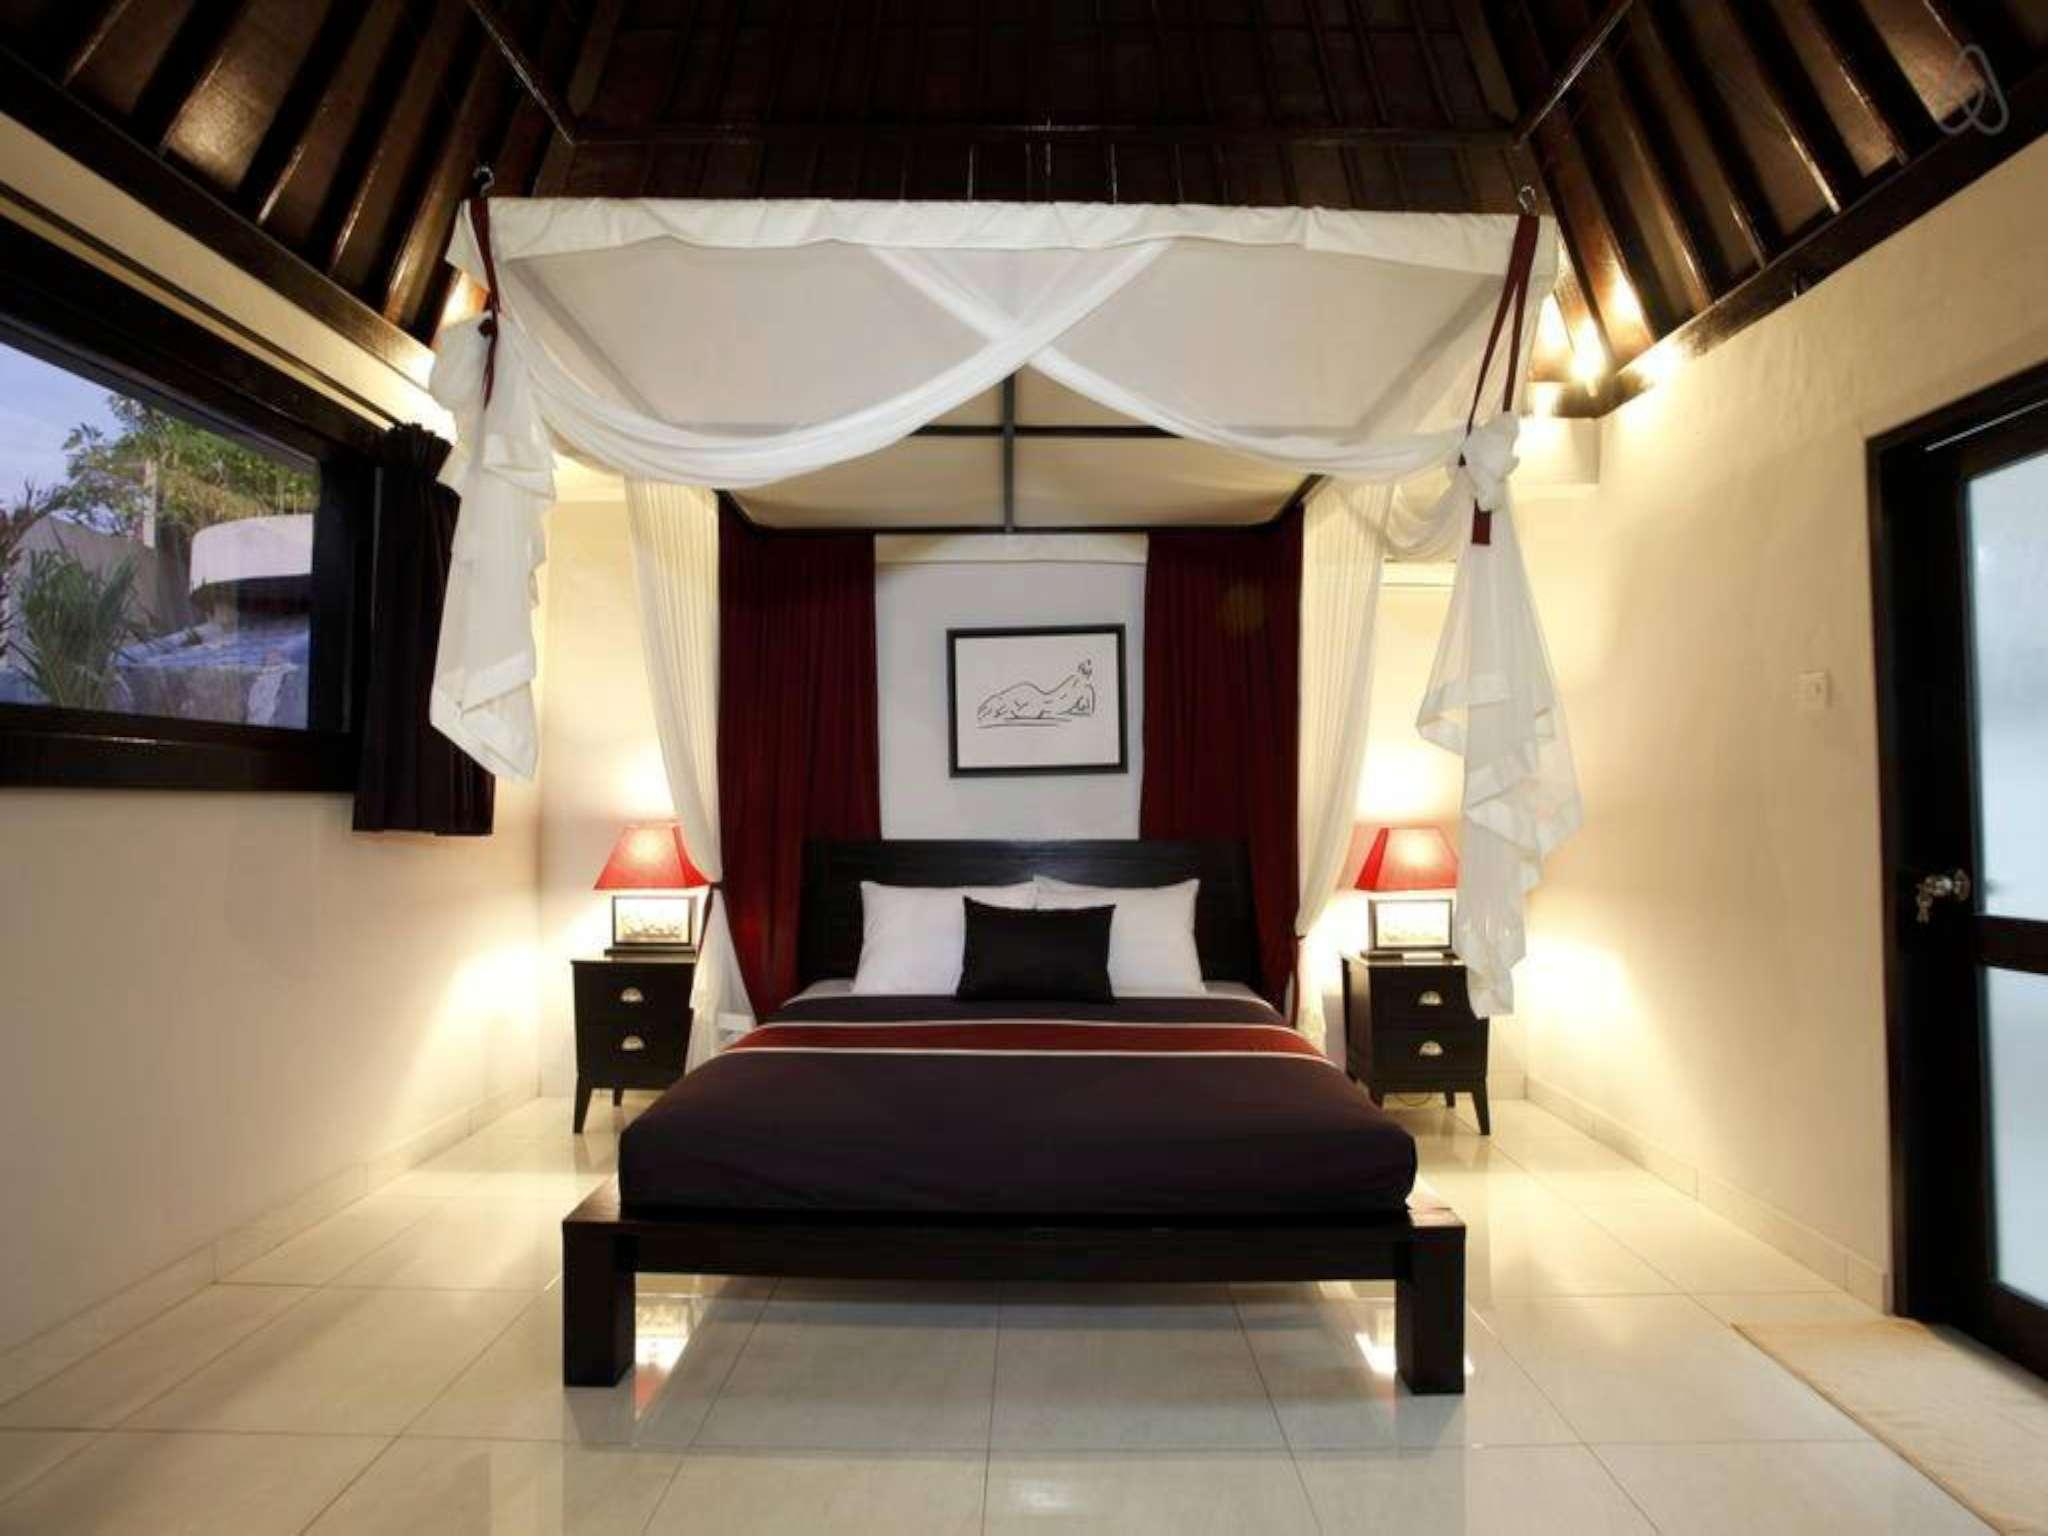 2BDR Villa With Private Pool Close Seminyak Beach